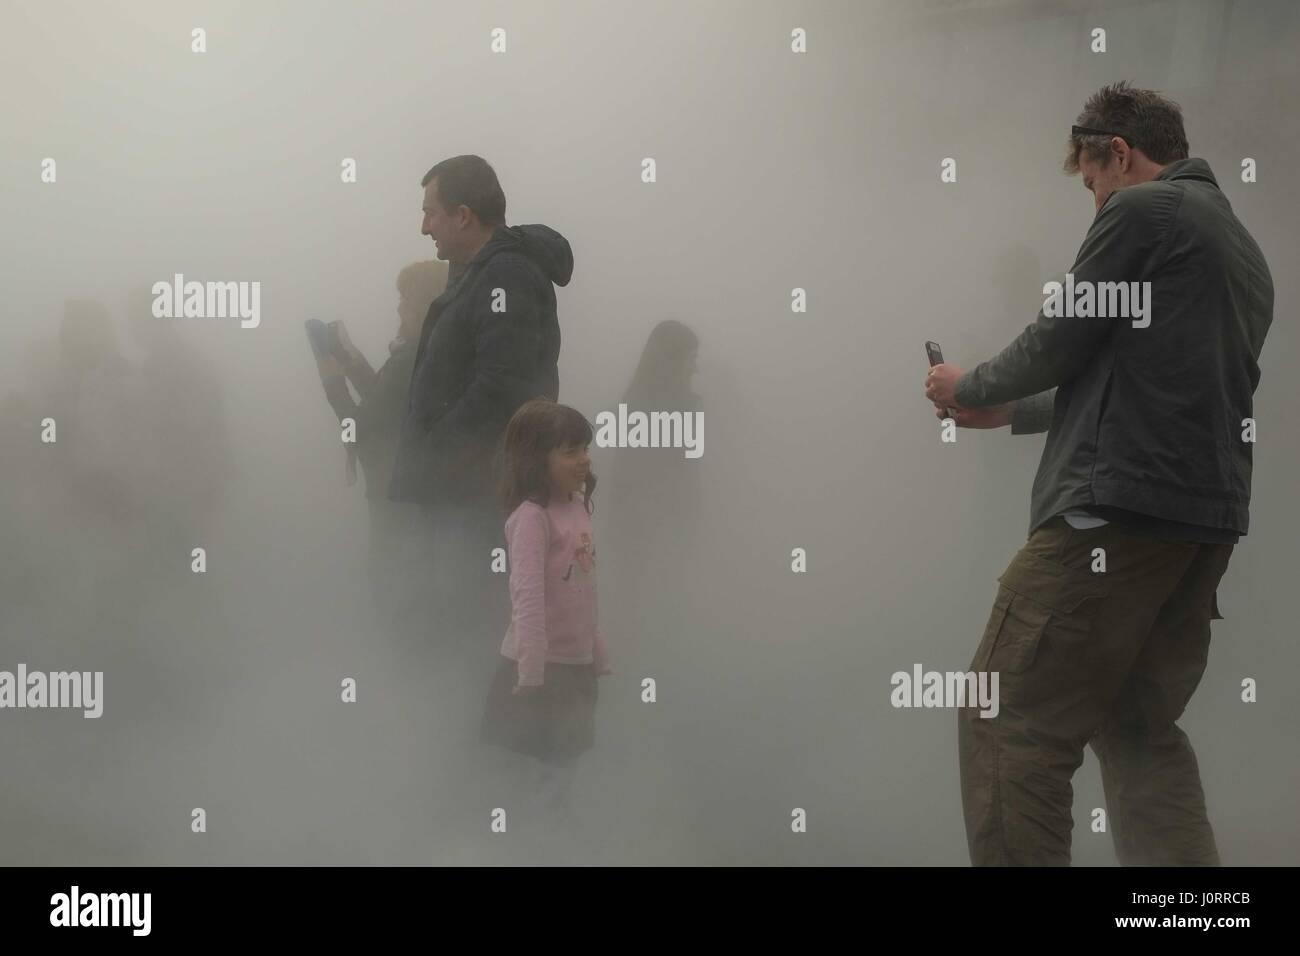 London, UK. 15th April 2017. Visitors continue to explore  Fujiko Nakaya's fog sculpture outside Tate Modern's Switch Stock Photo